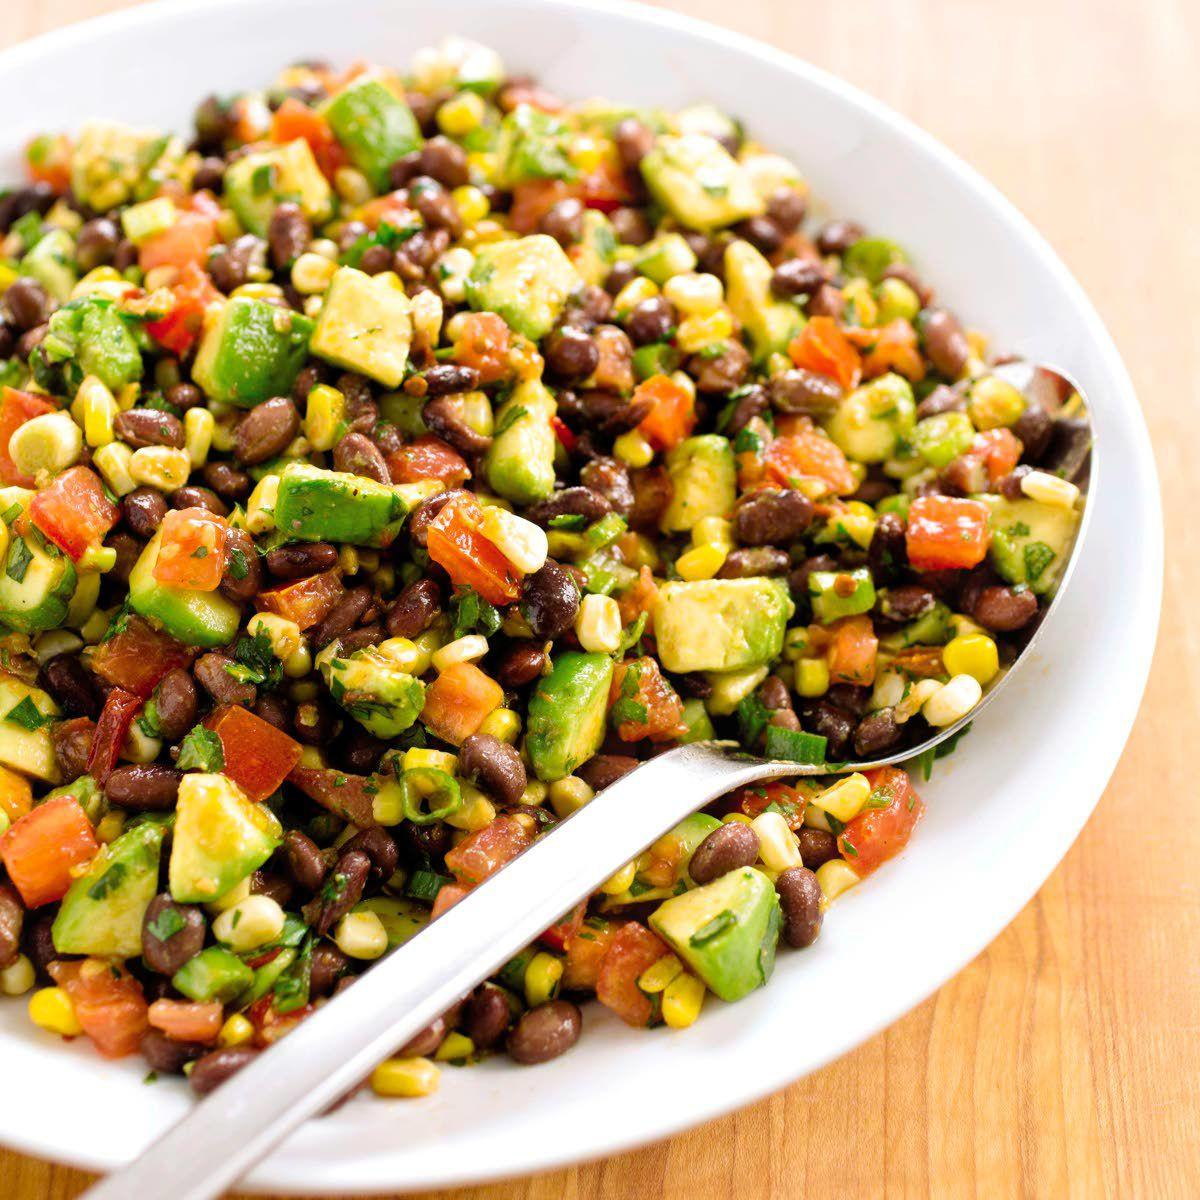 Summery bean salad has corn, avocado